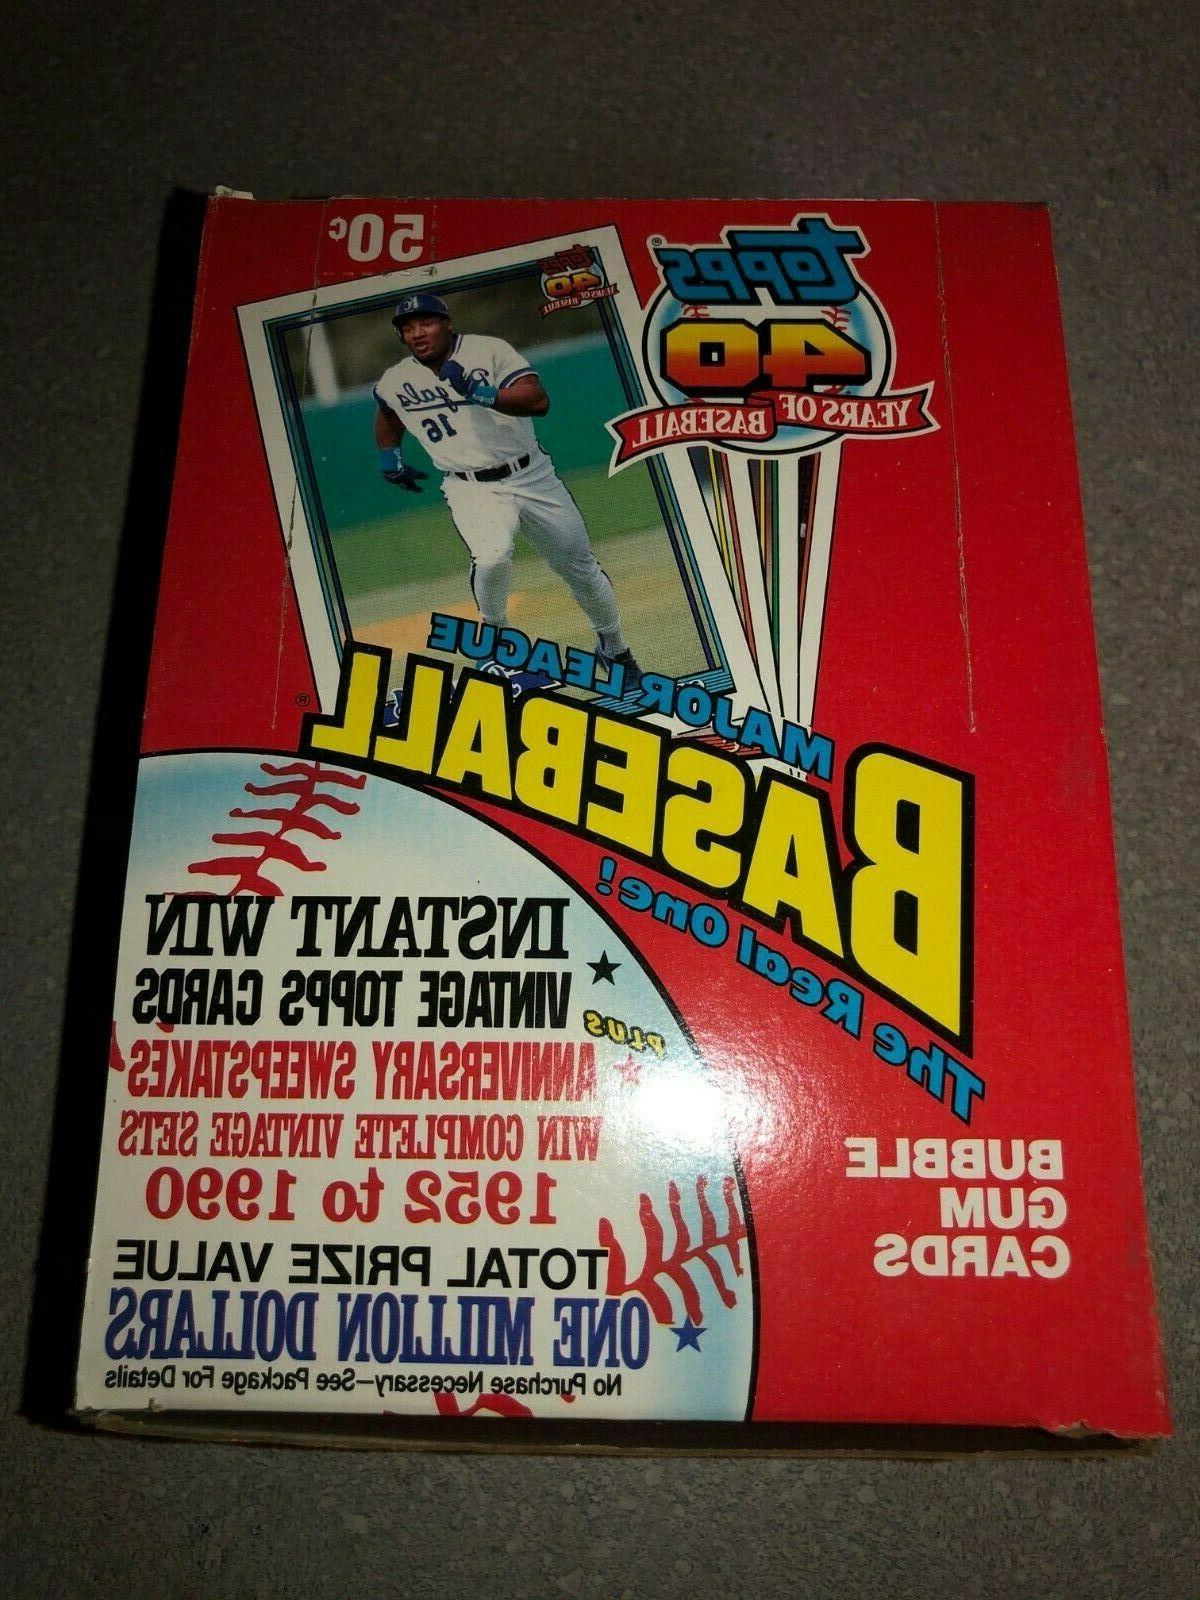 1991 topps baseball box of 36 wax